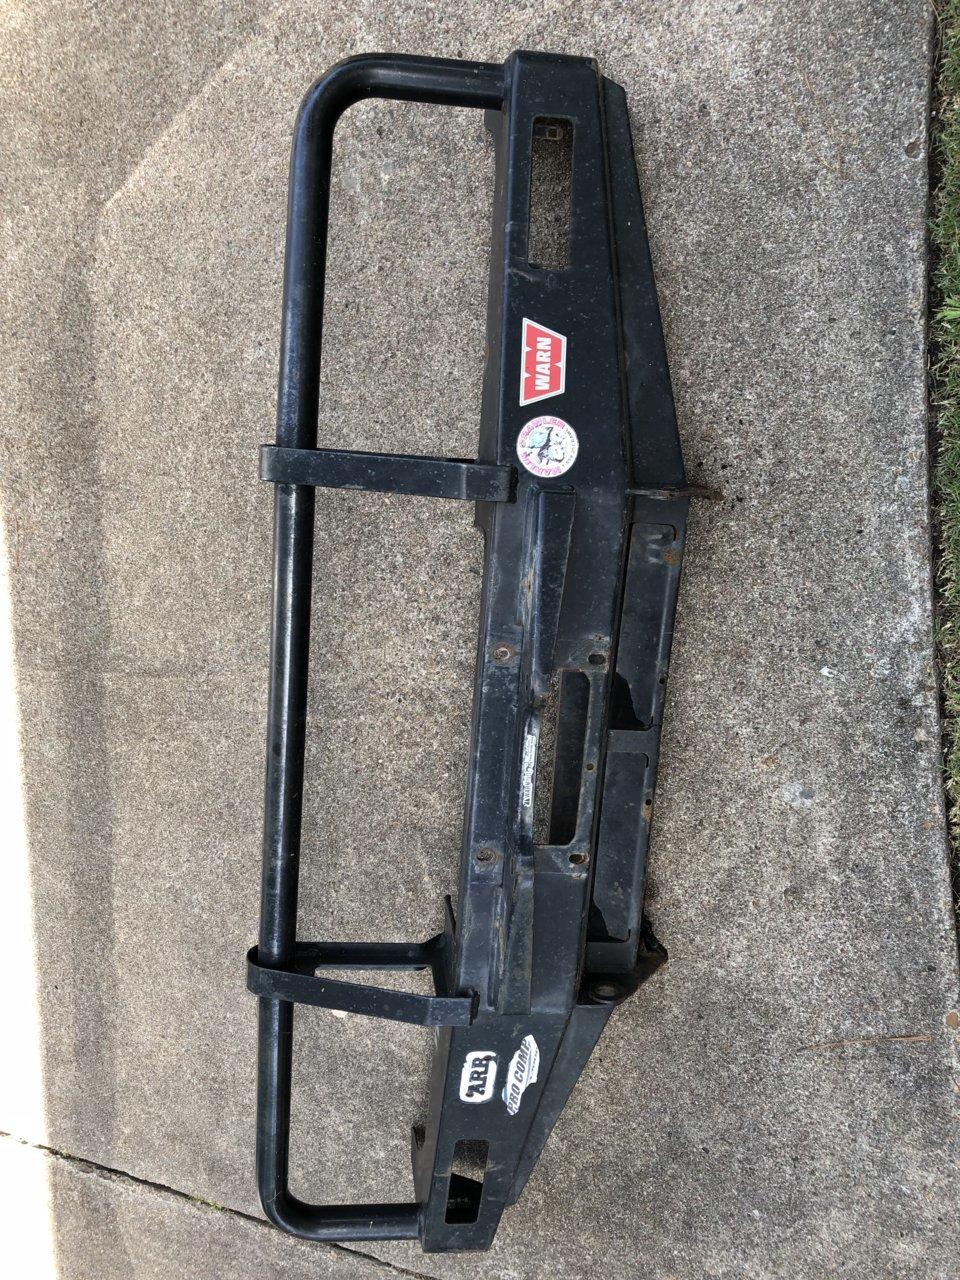 Genuine ARB front bumper for 1st Gen 4Runner for sale